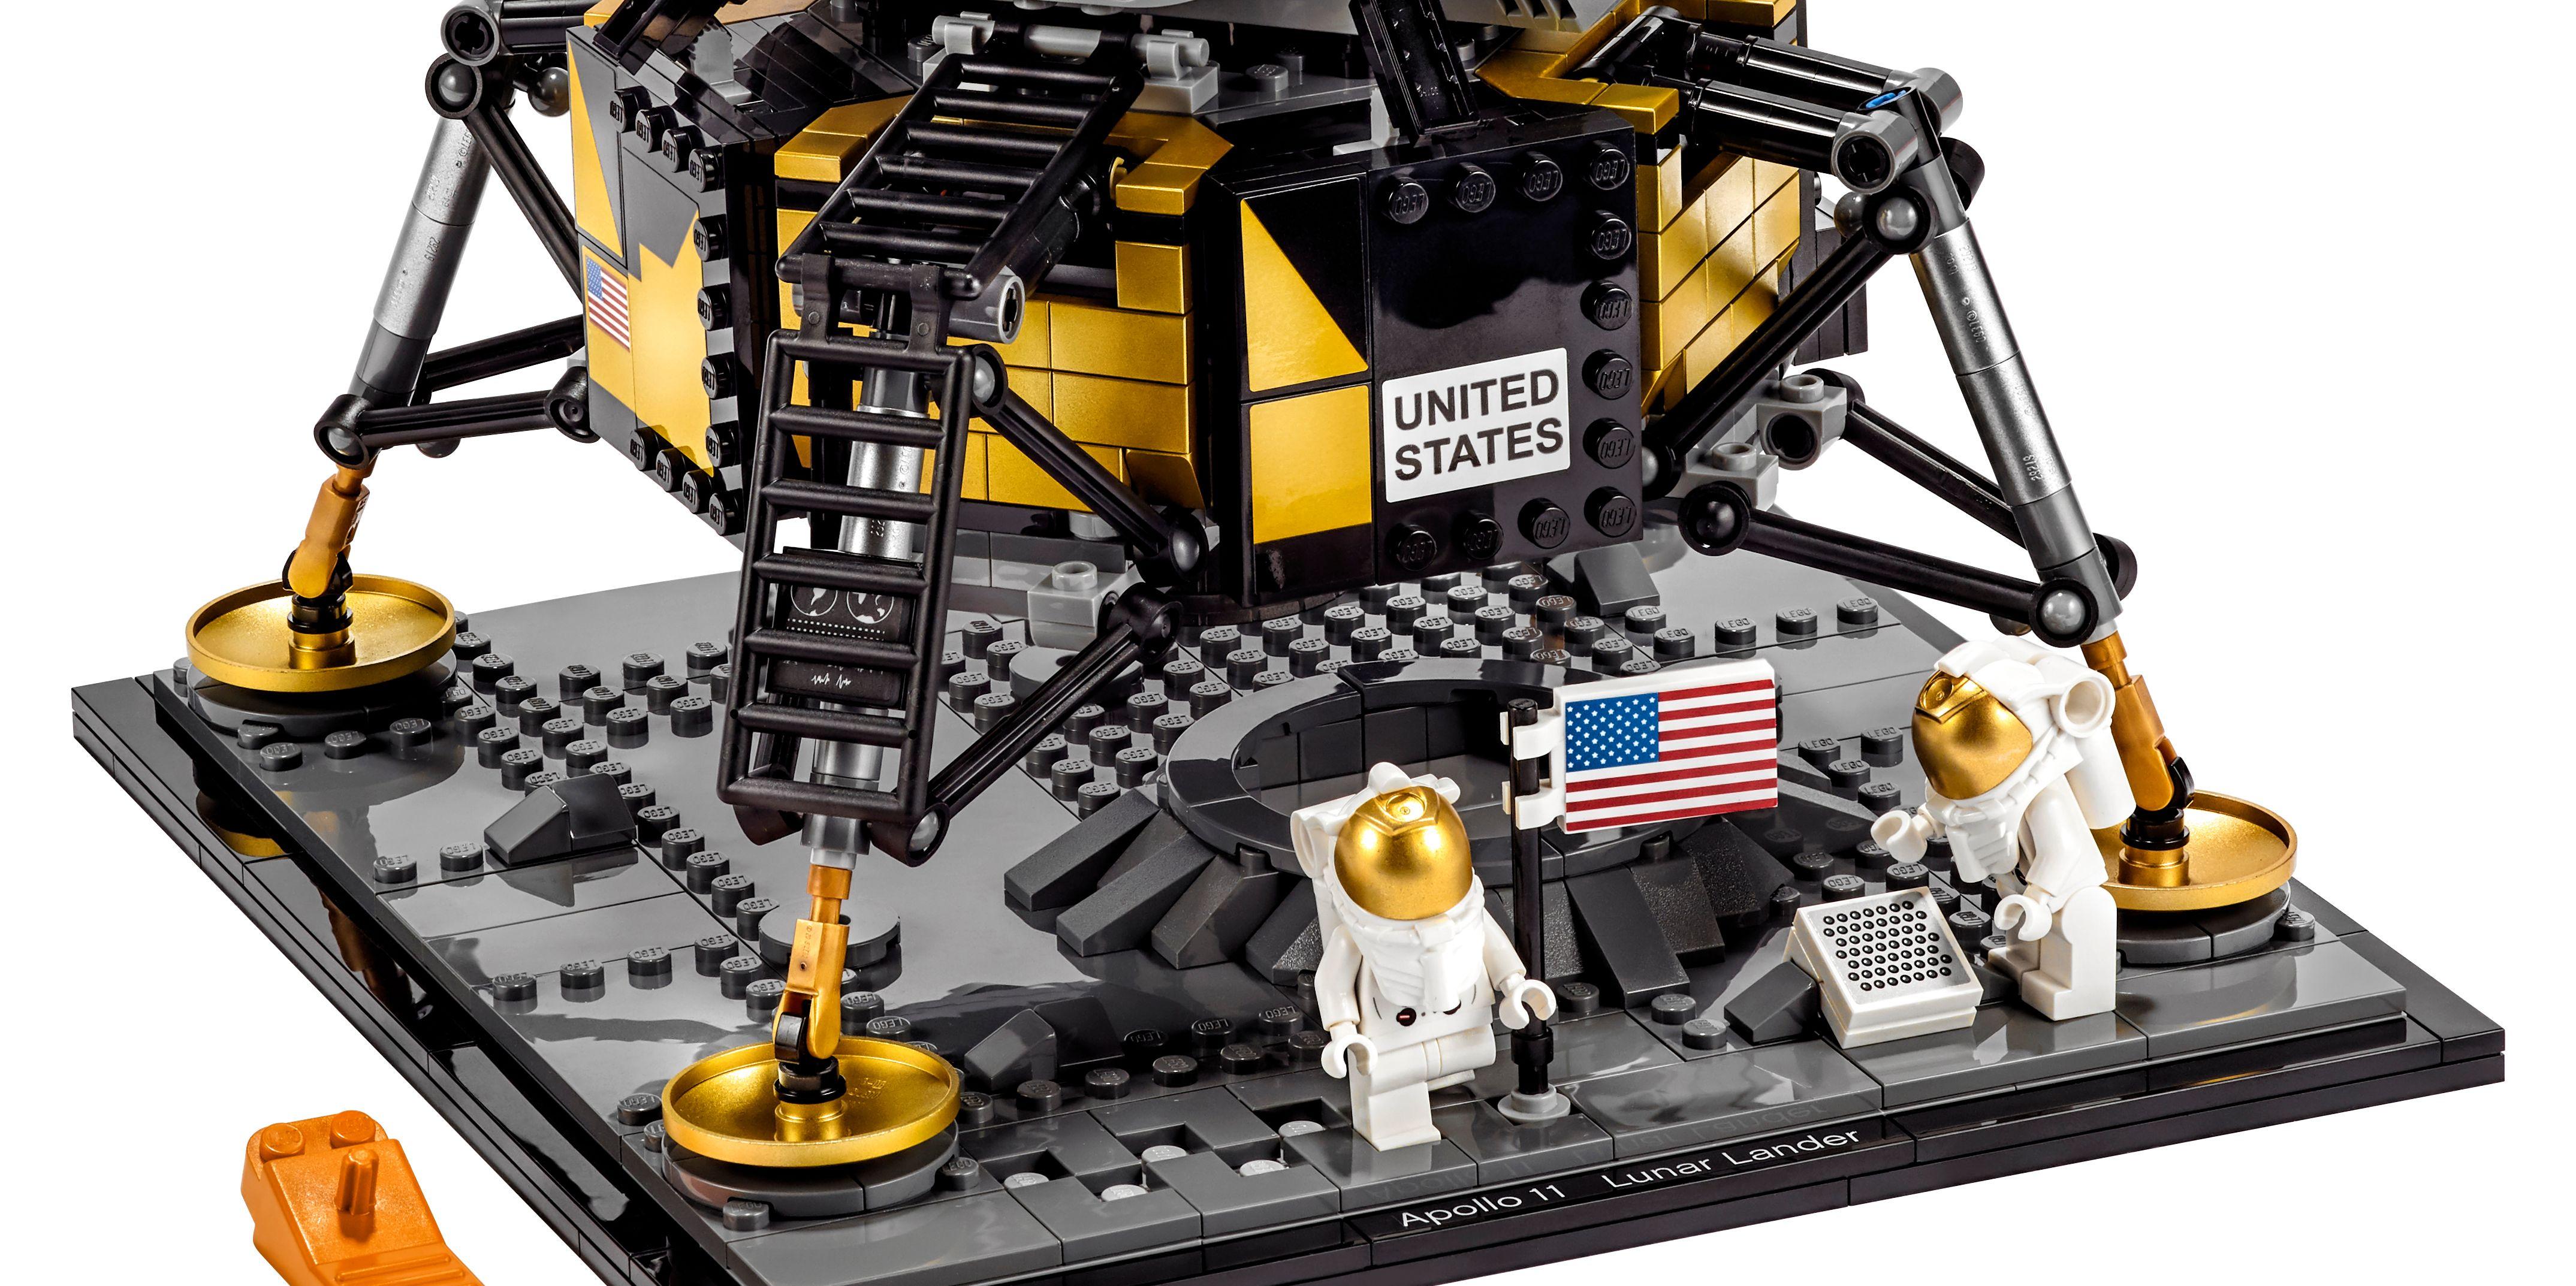 apollo space landing anniversary - photo #38